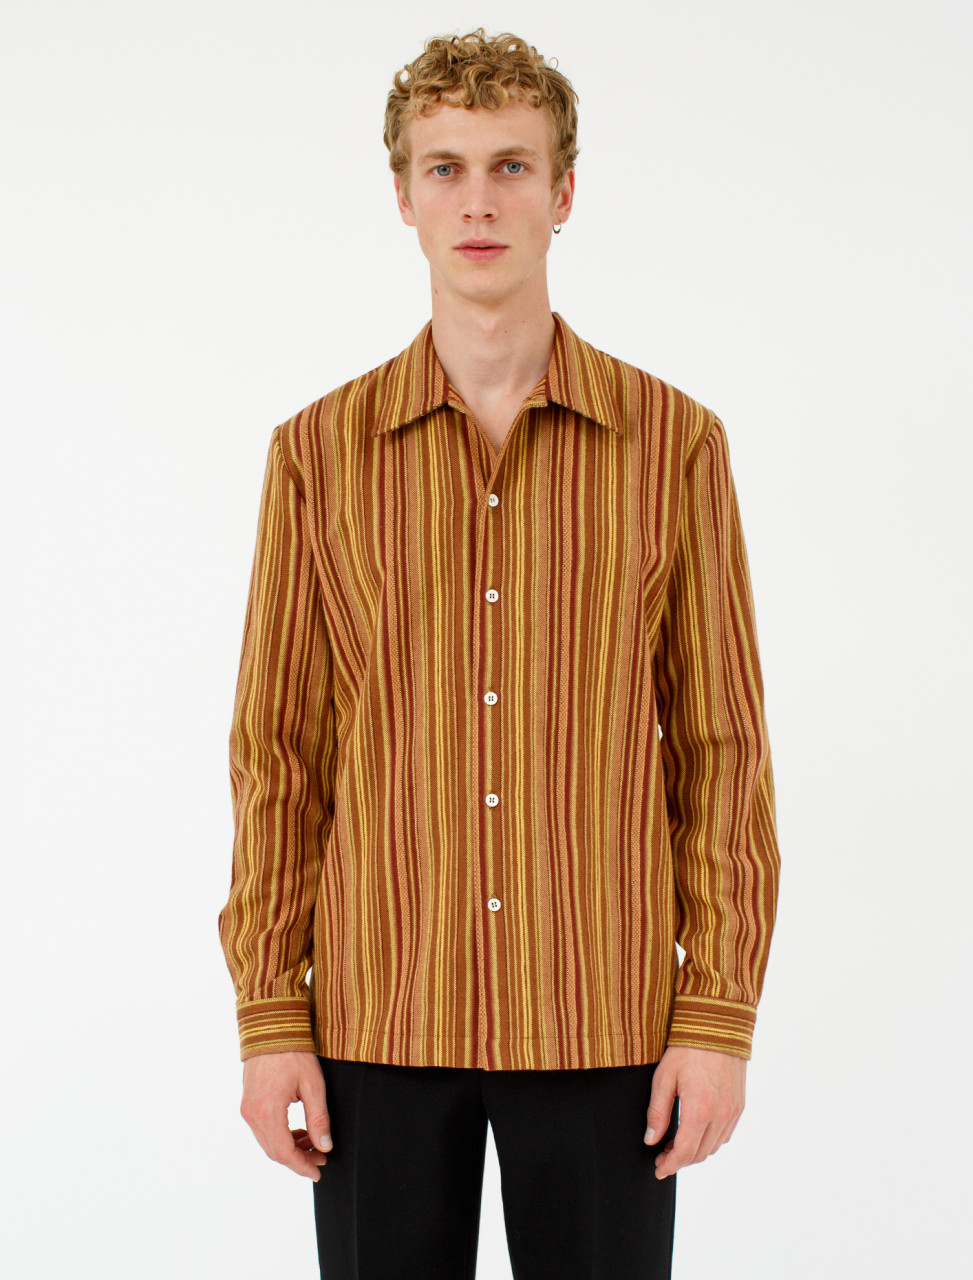 Ripley Shirt